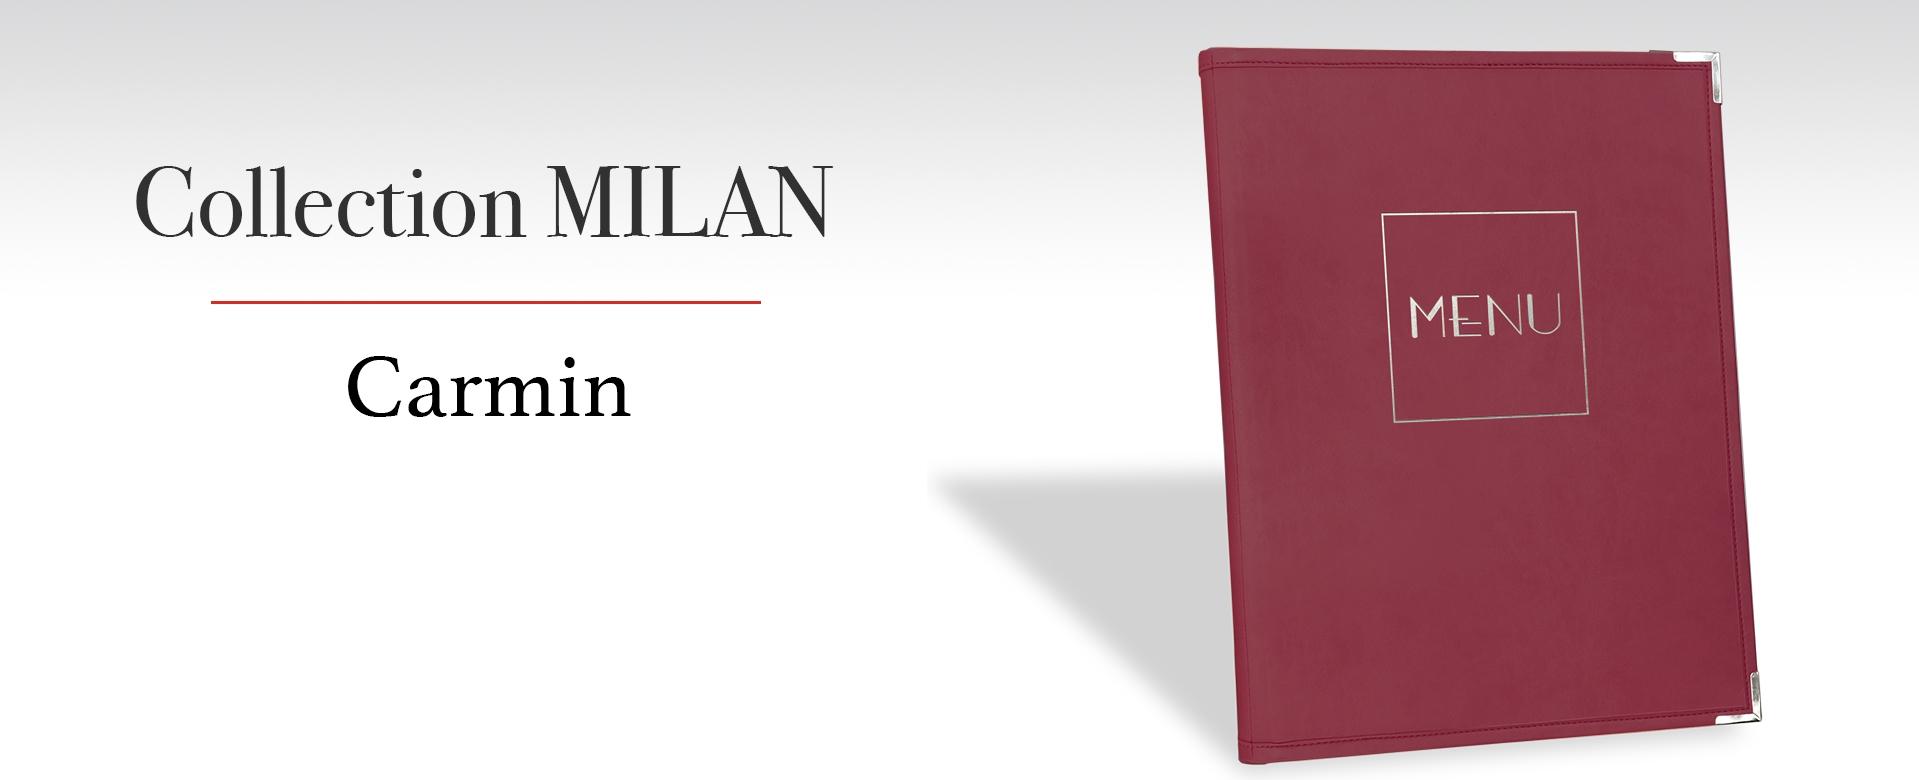 Protege-menu Carmin Café Hôtel Restaurant MILAN